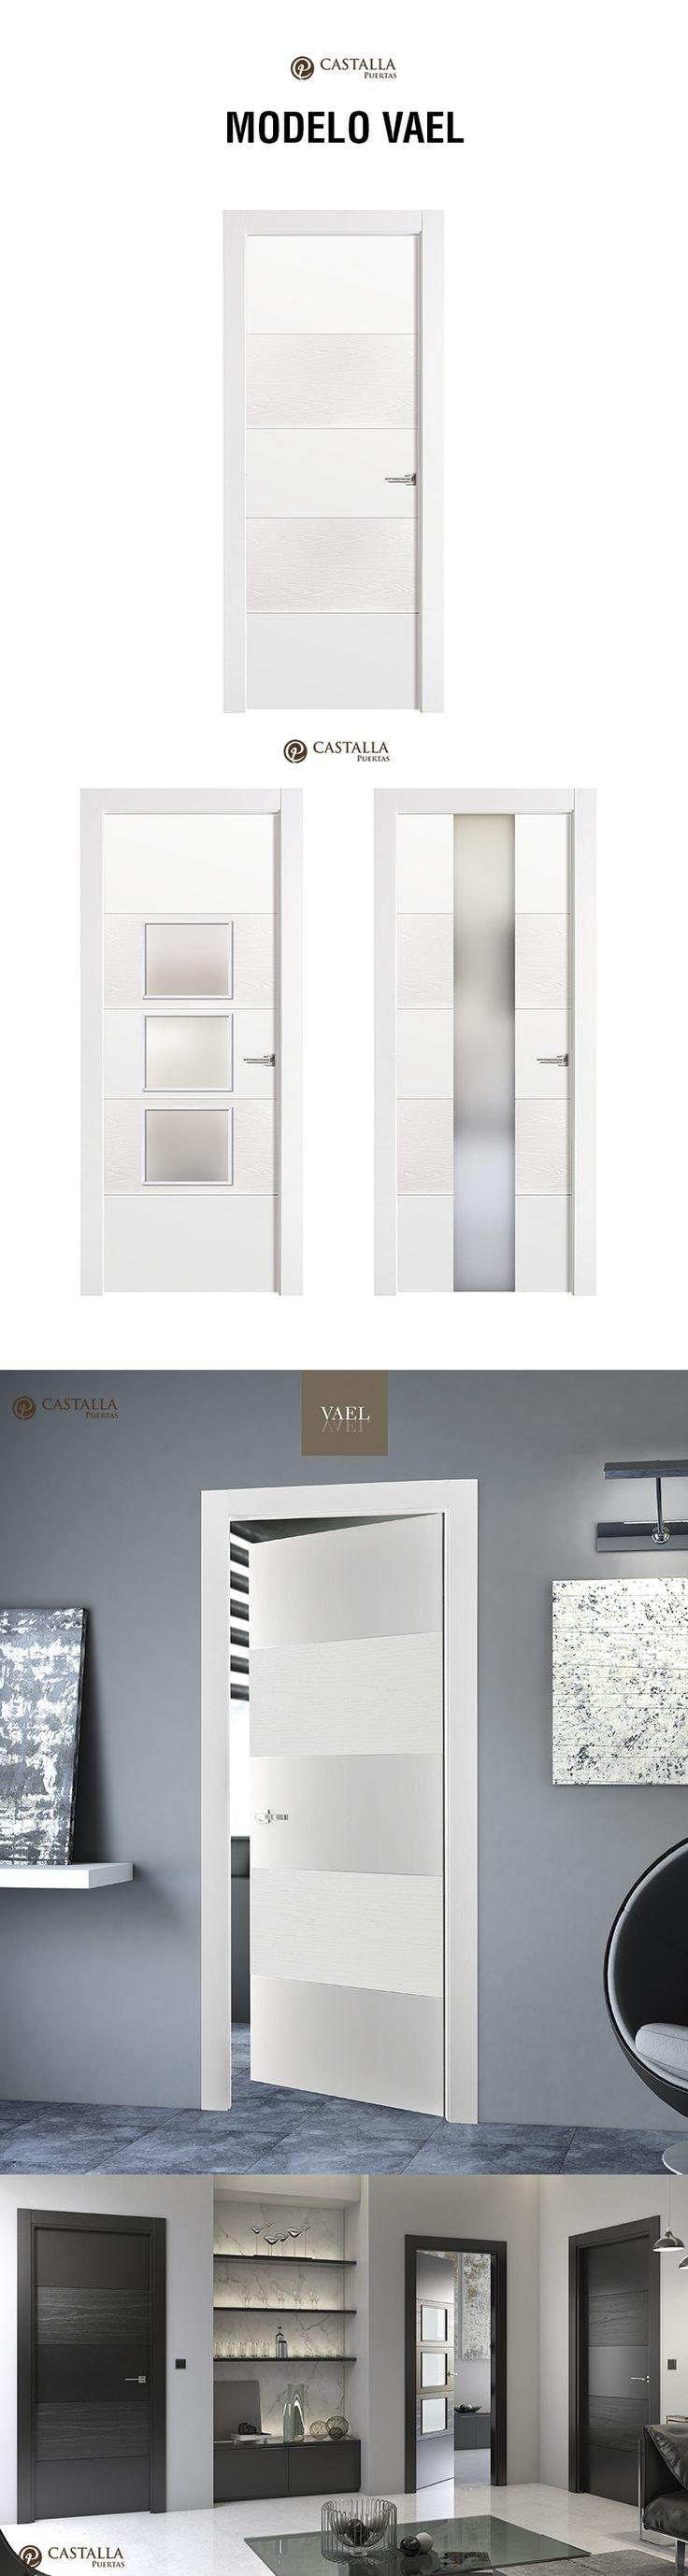 Puerta de interior con cristal Modelo VAEL. Puertas Castalla glass interior door model VAEL Castalla Doors